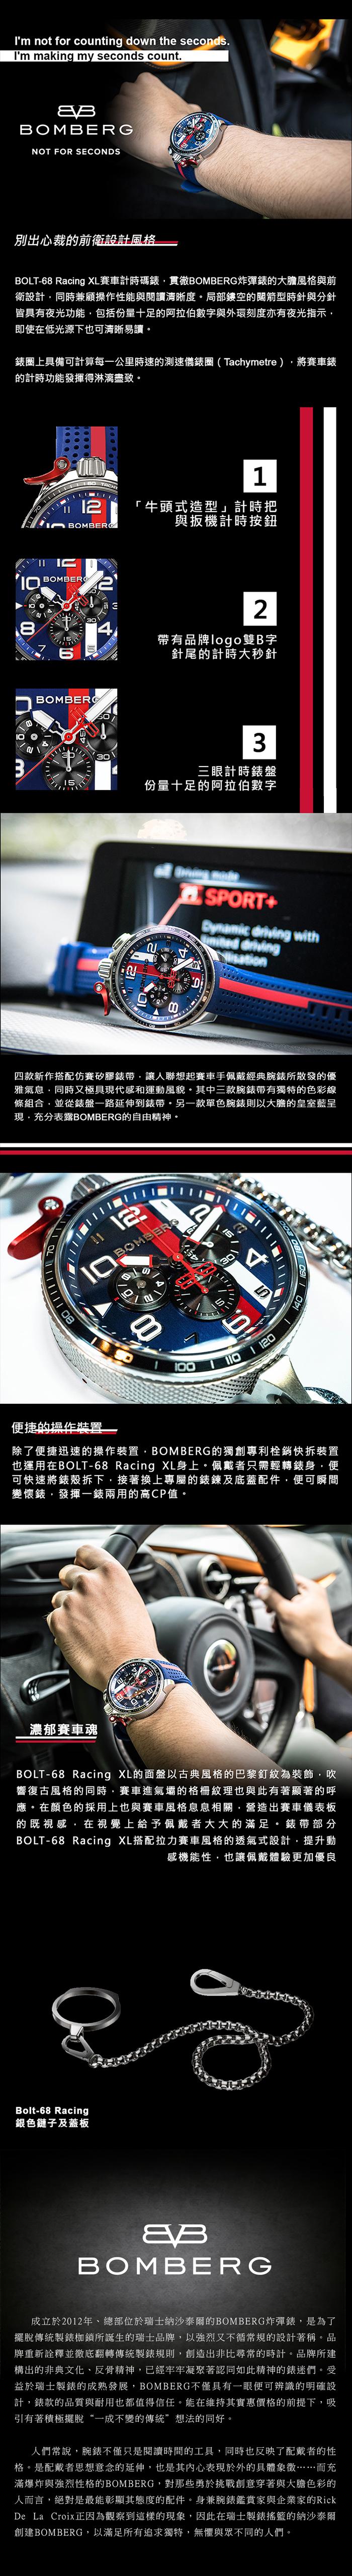 BOMBERG|BOLT - 68 RACING 系列 全鋼藍面XL復古賽車計時碼錶-錶徑 45mm